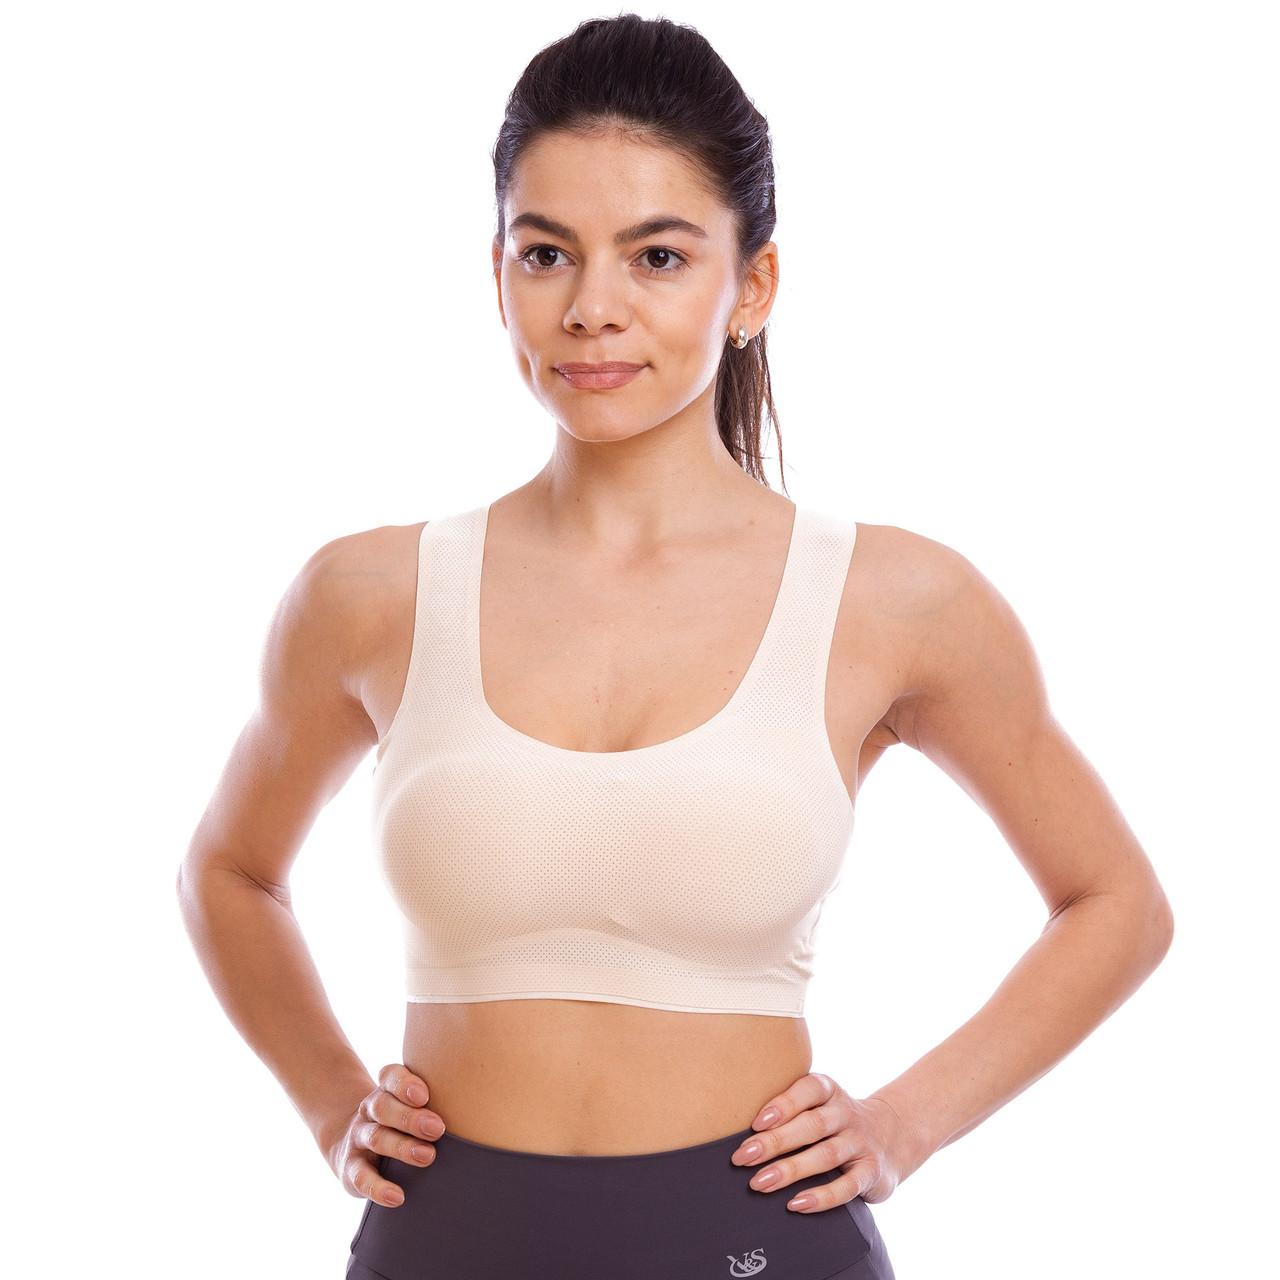 Топ для фитнеса и йоги размер S-L-40-48 Бежевый PZ-CO-1864_1